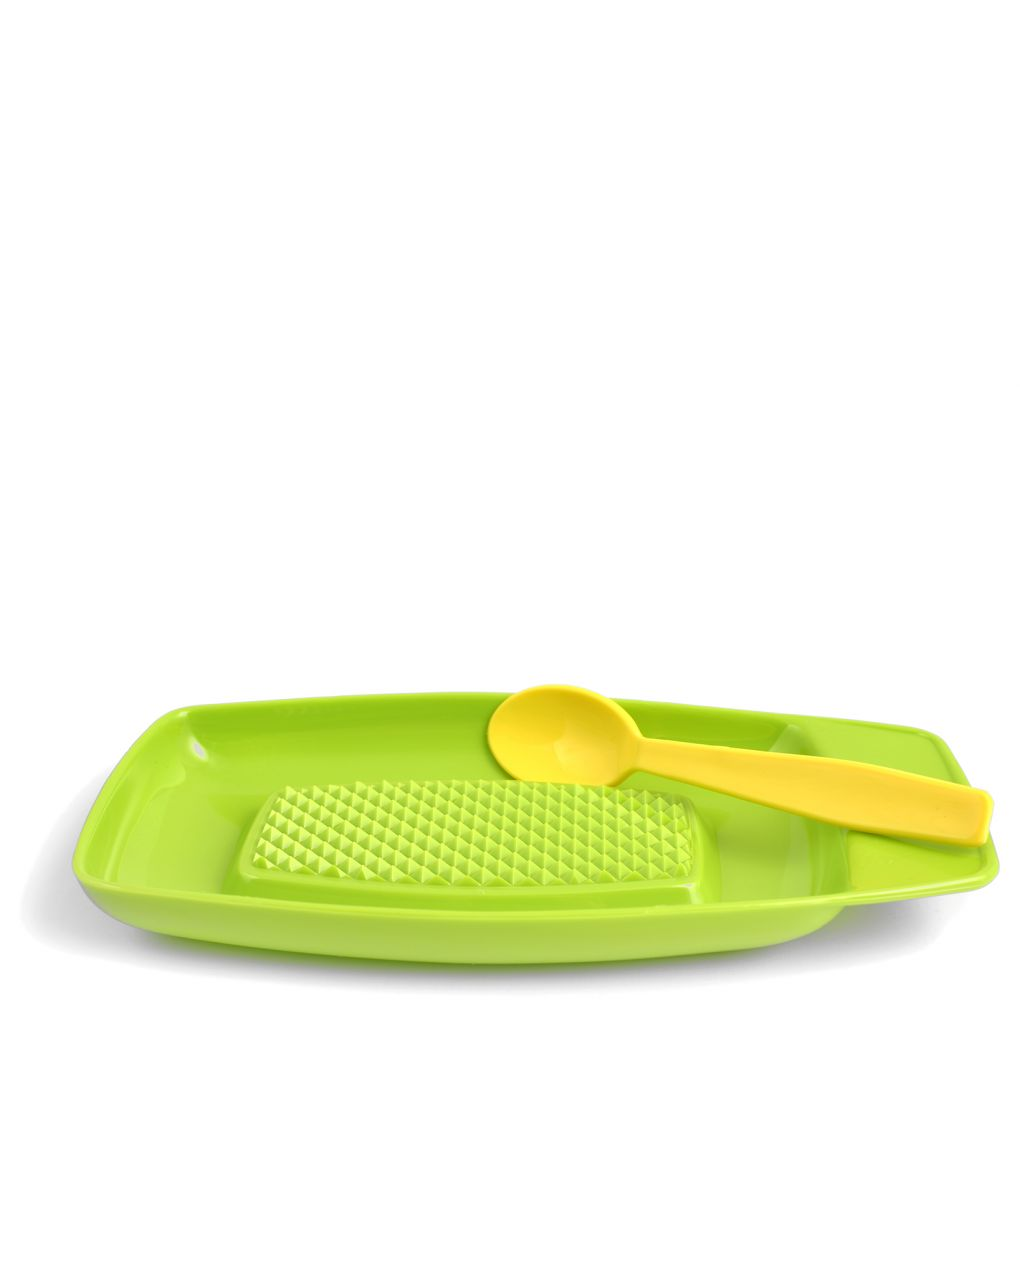 Grattuggia mele in plastica con cucchiaino - Lulabi Disney